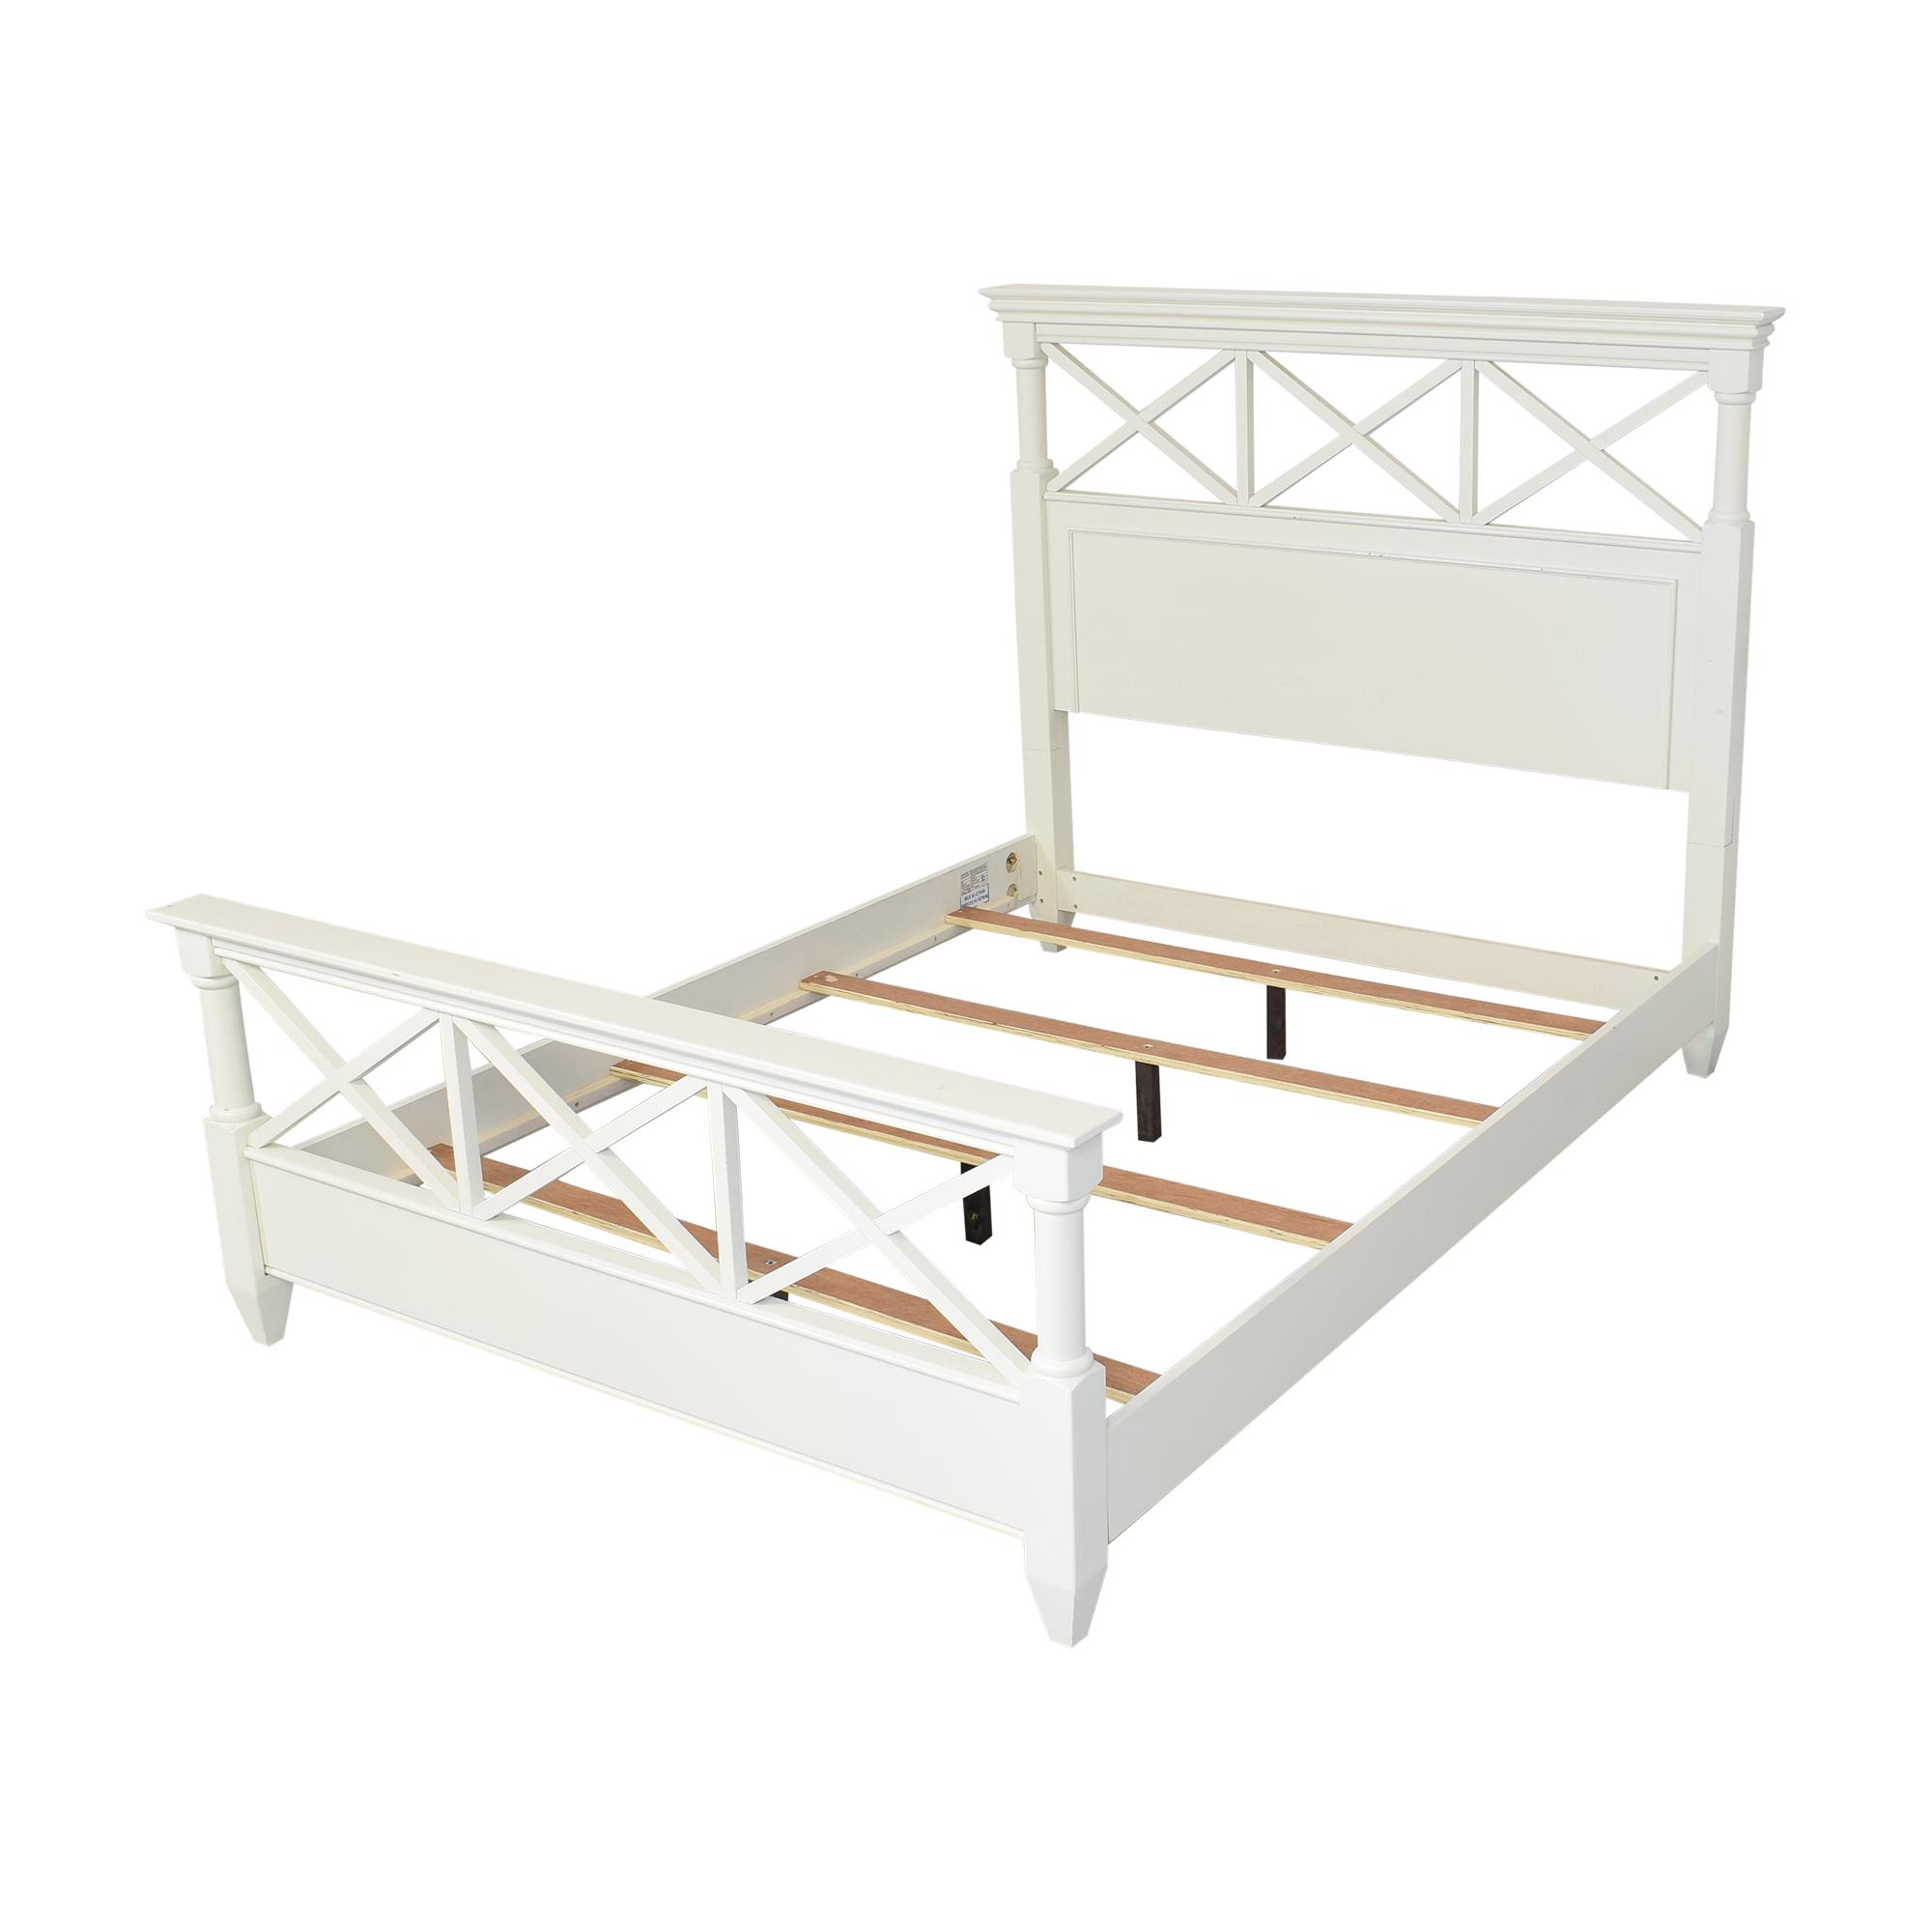 Magnussen Home Magnussen Home Queen Bed Frame nj